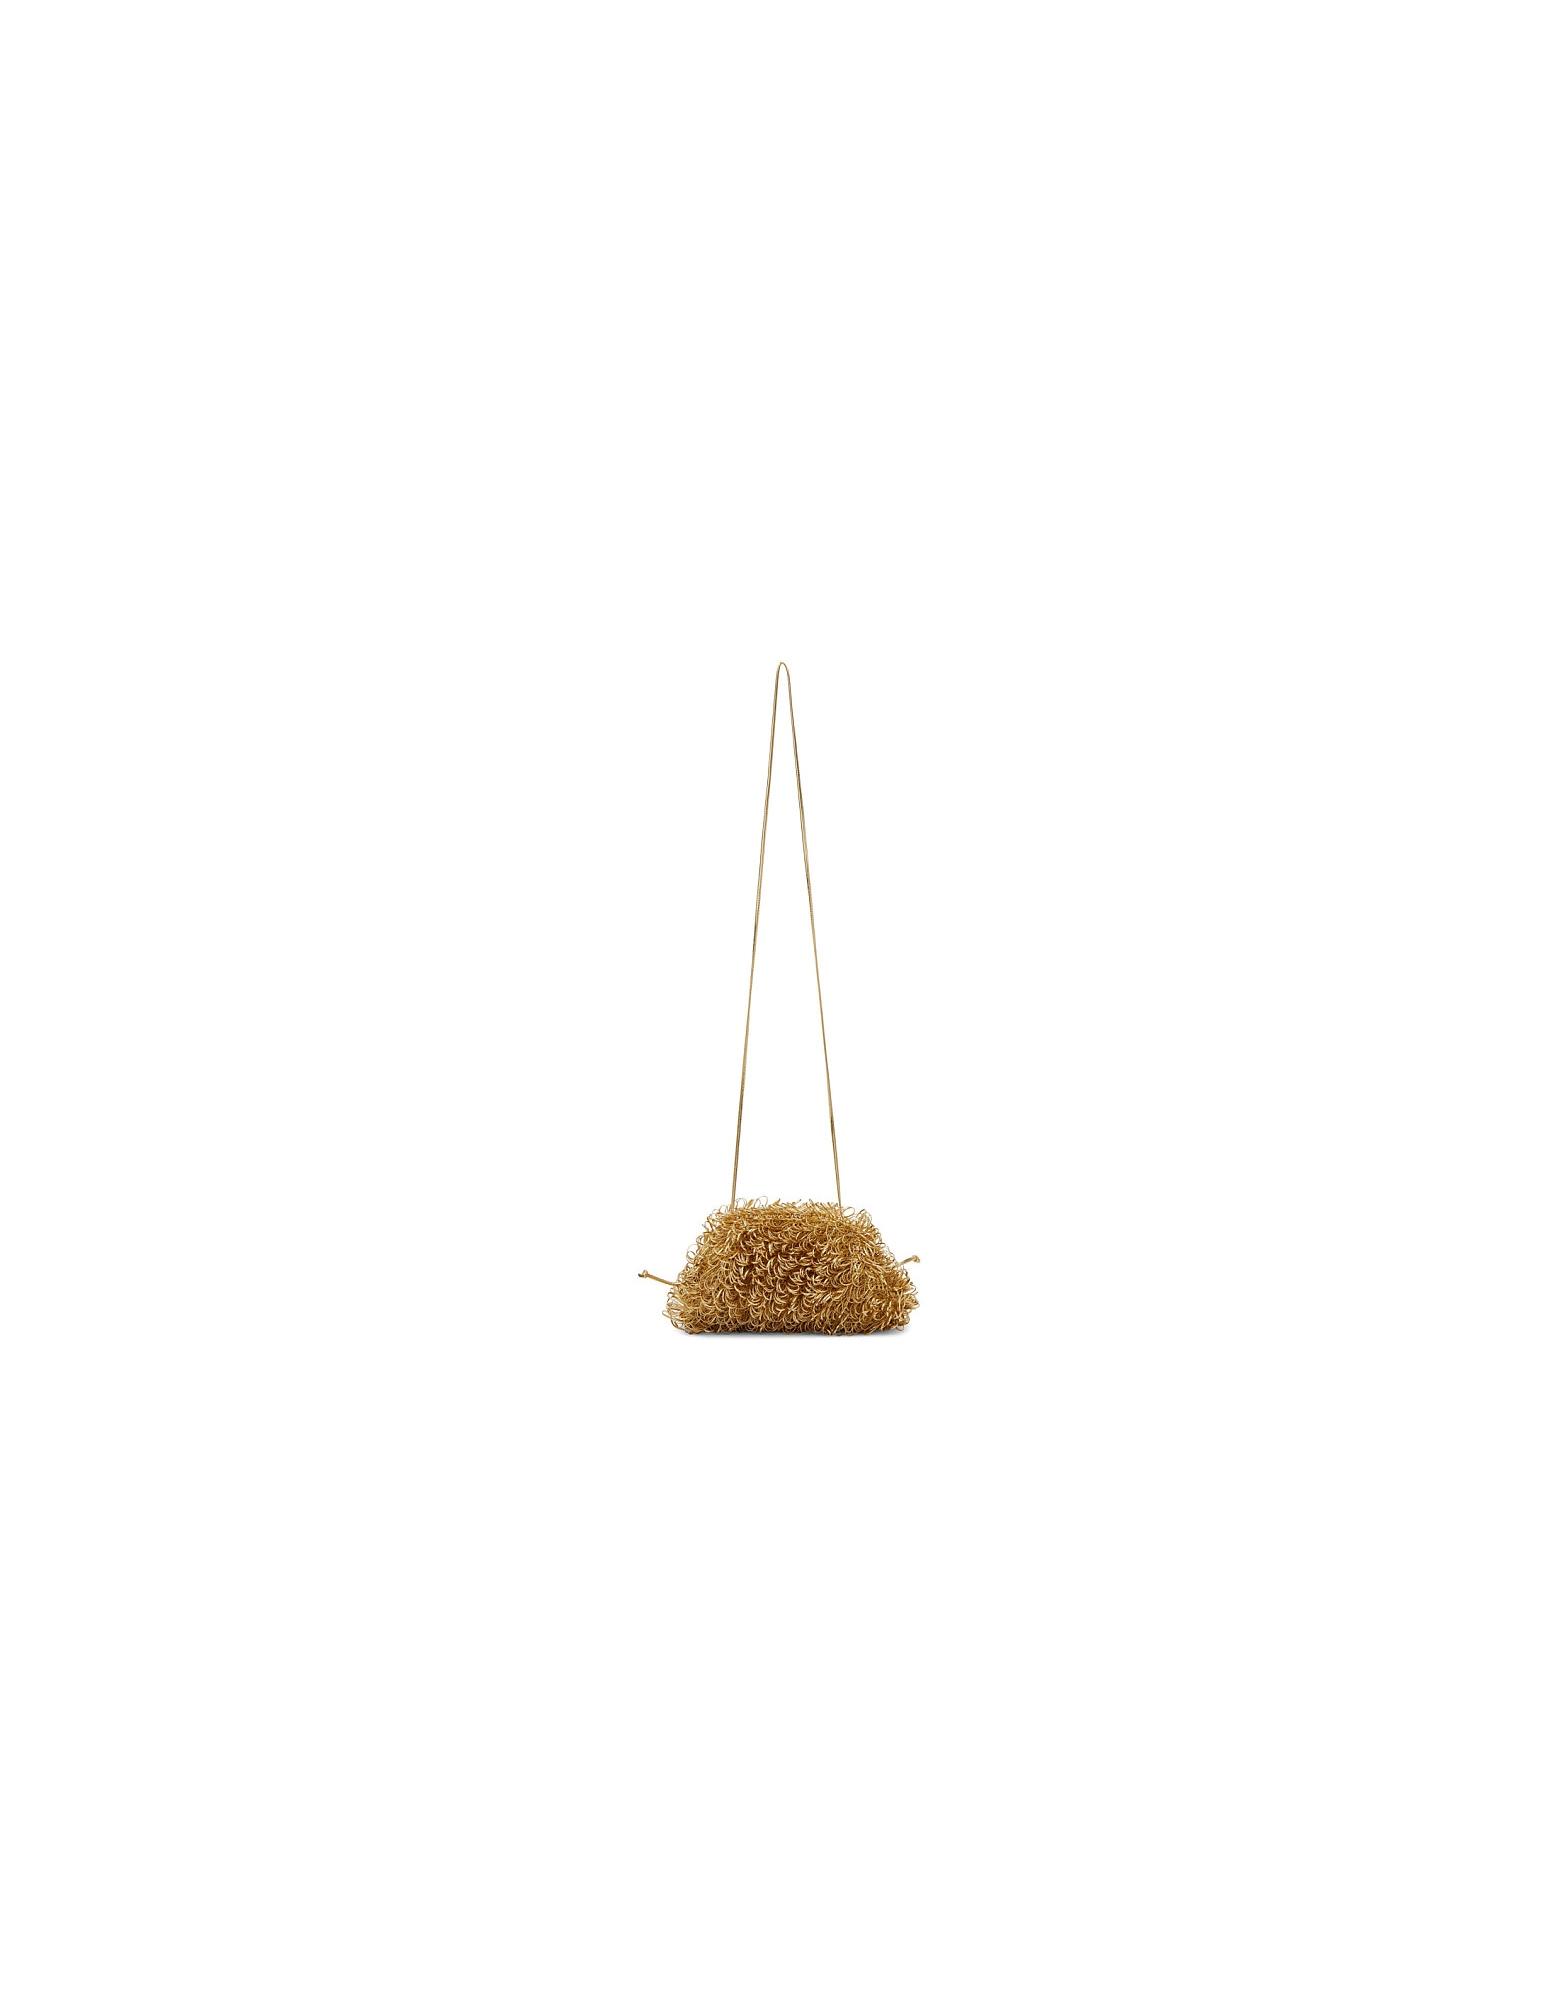 Bottega Veneta Designer Handbags, Gold Mini Curly Pouch